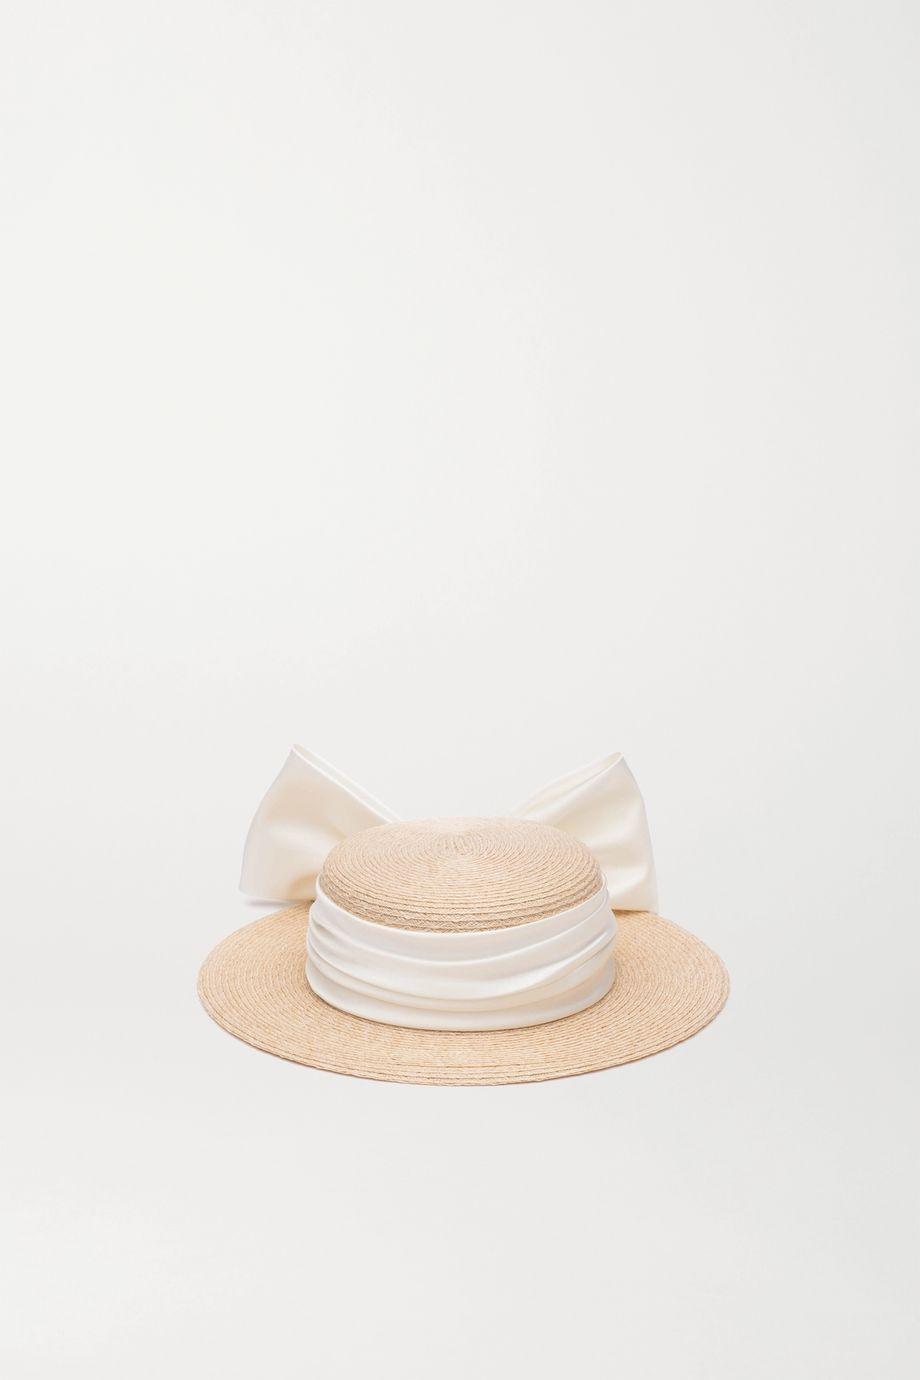 Eugenia Kim Brigette satin-trimmed straw hat